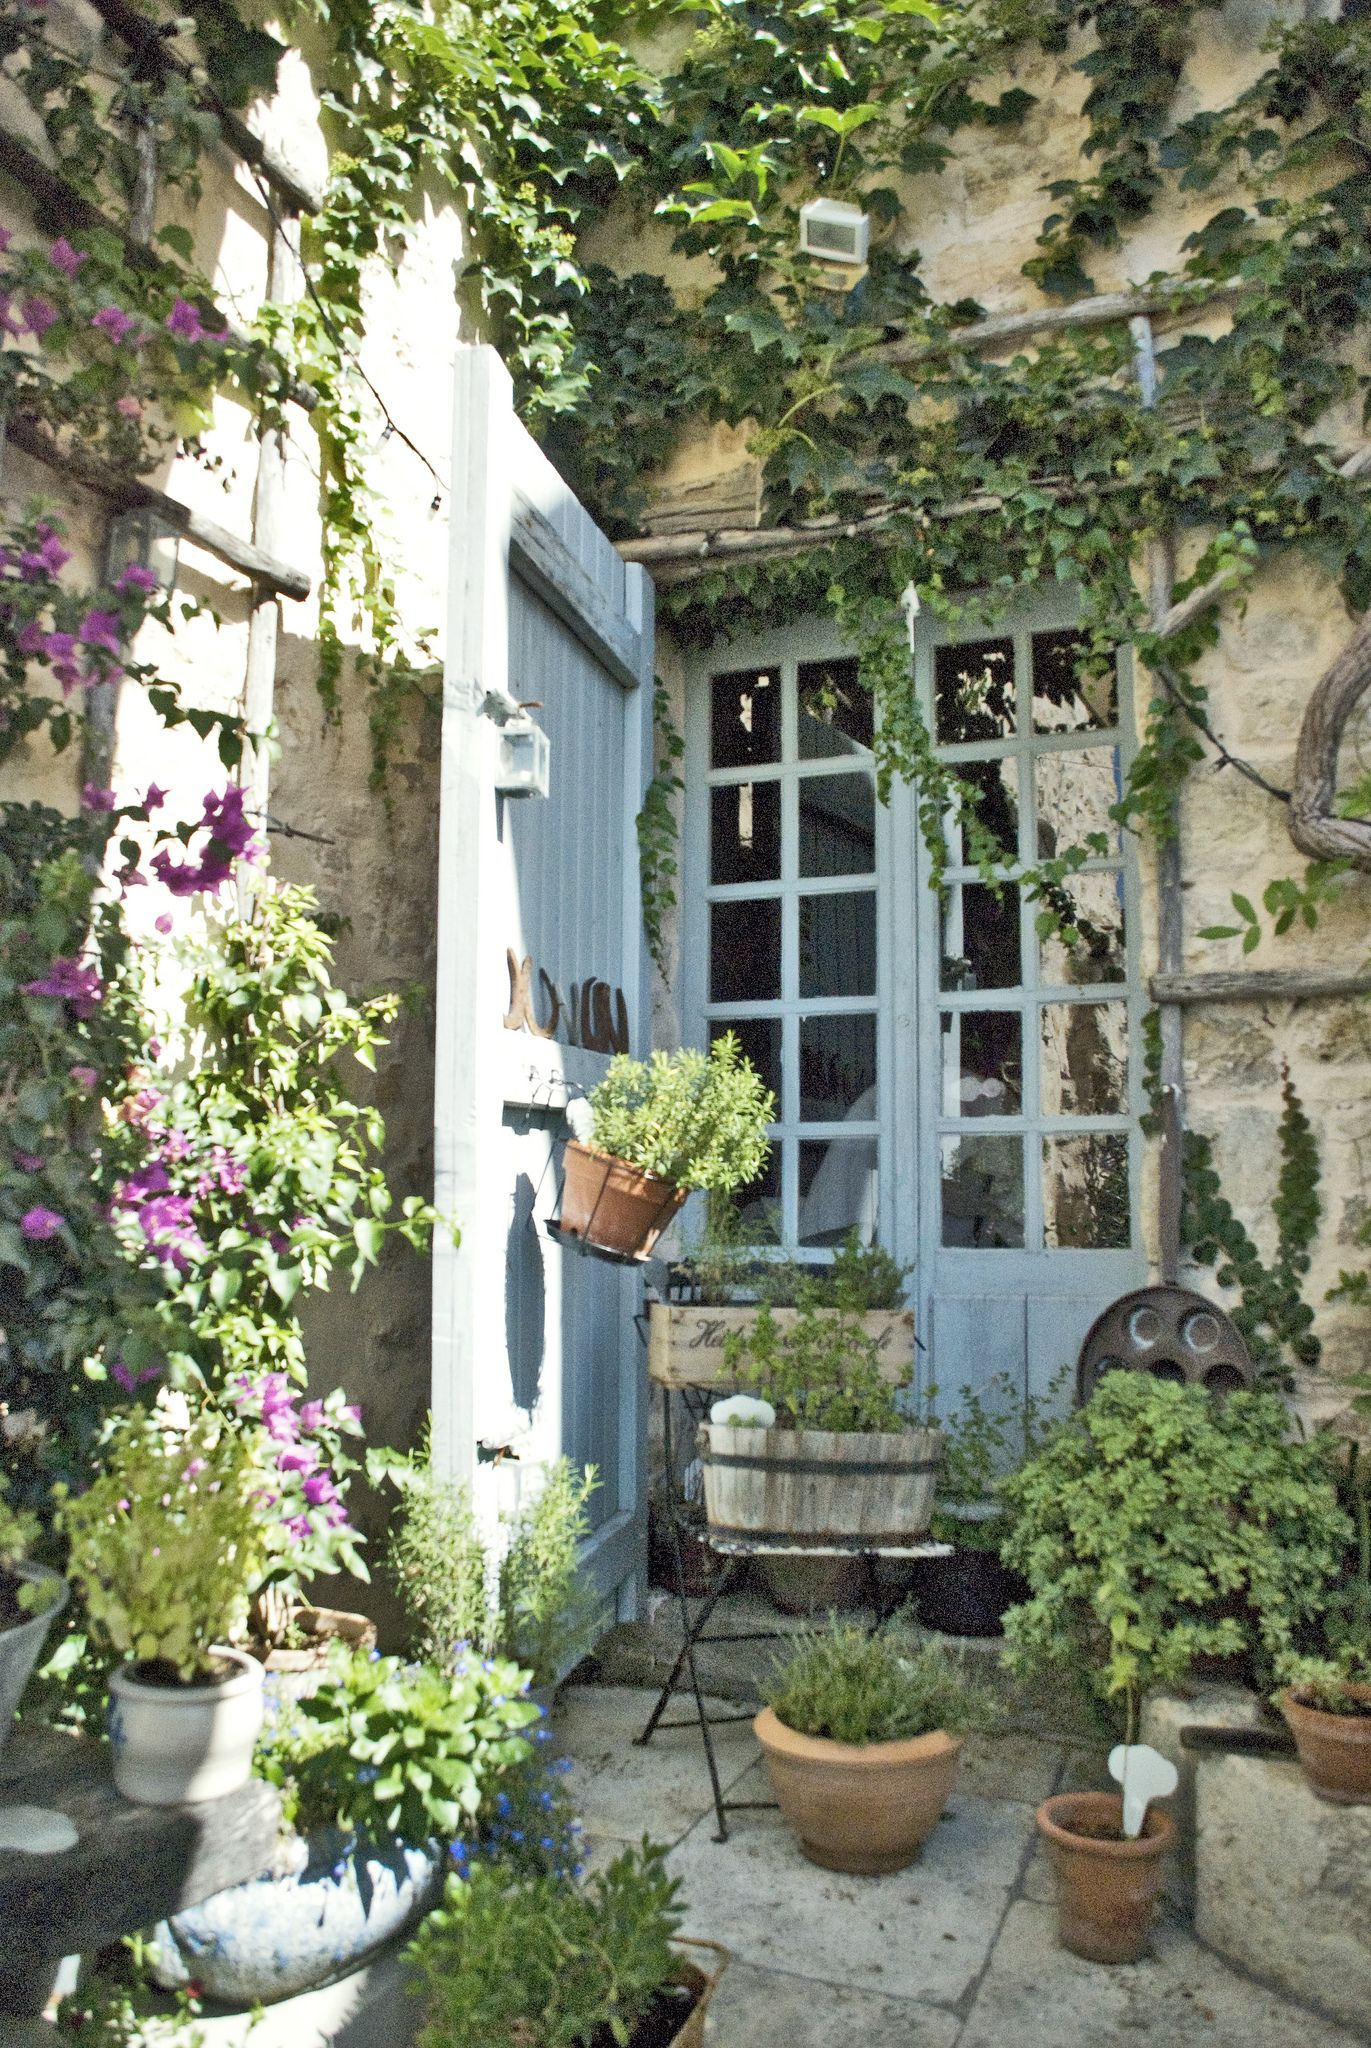 42+ French courtyard garden ideas ideas in 2021